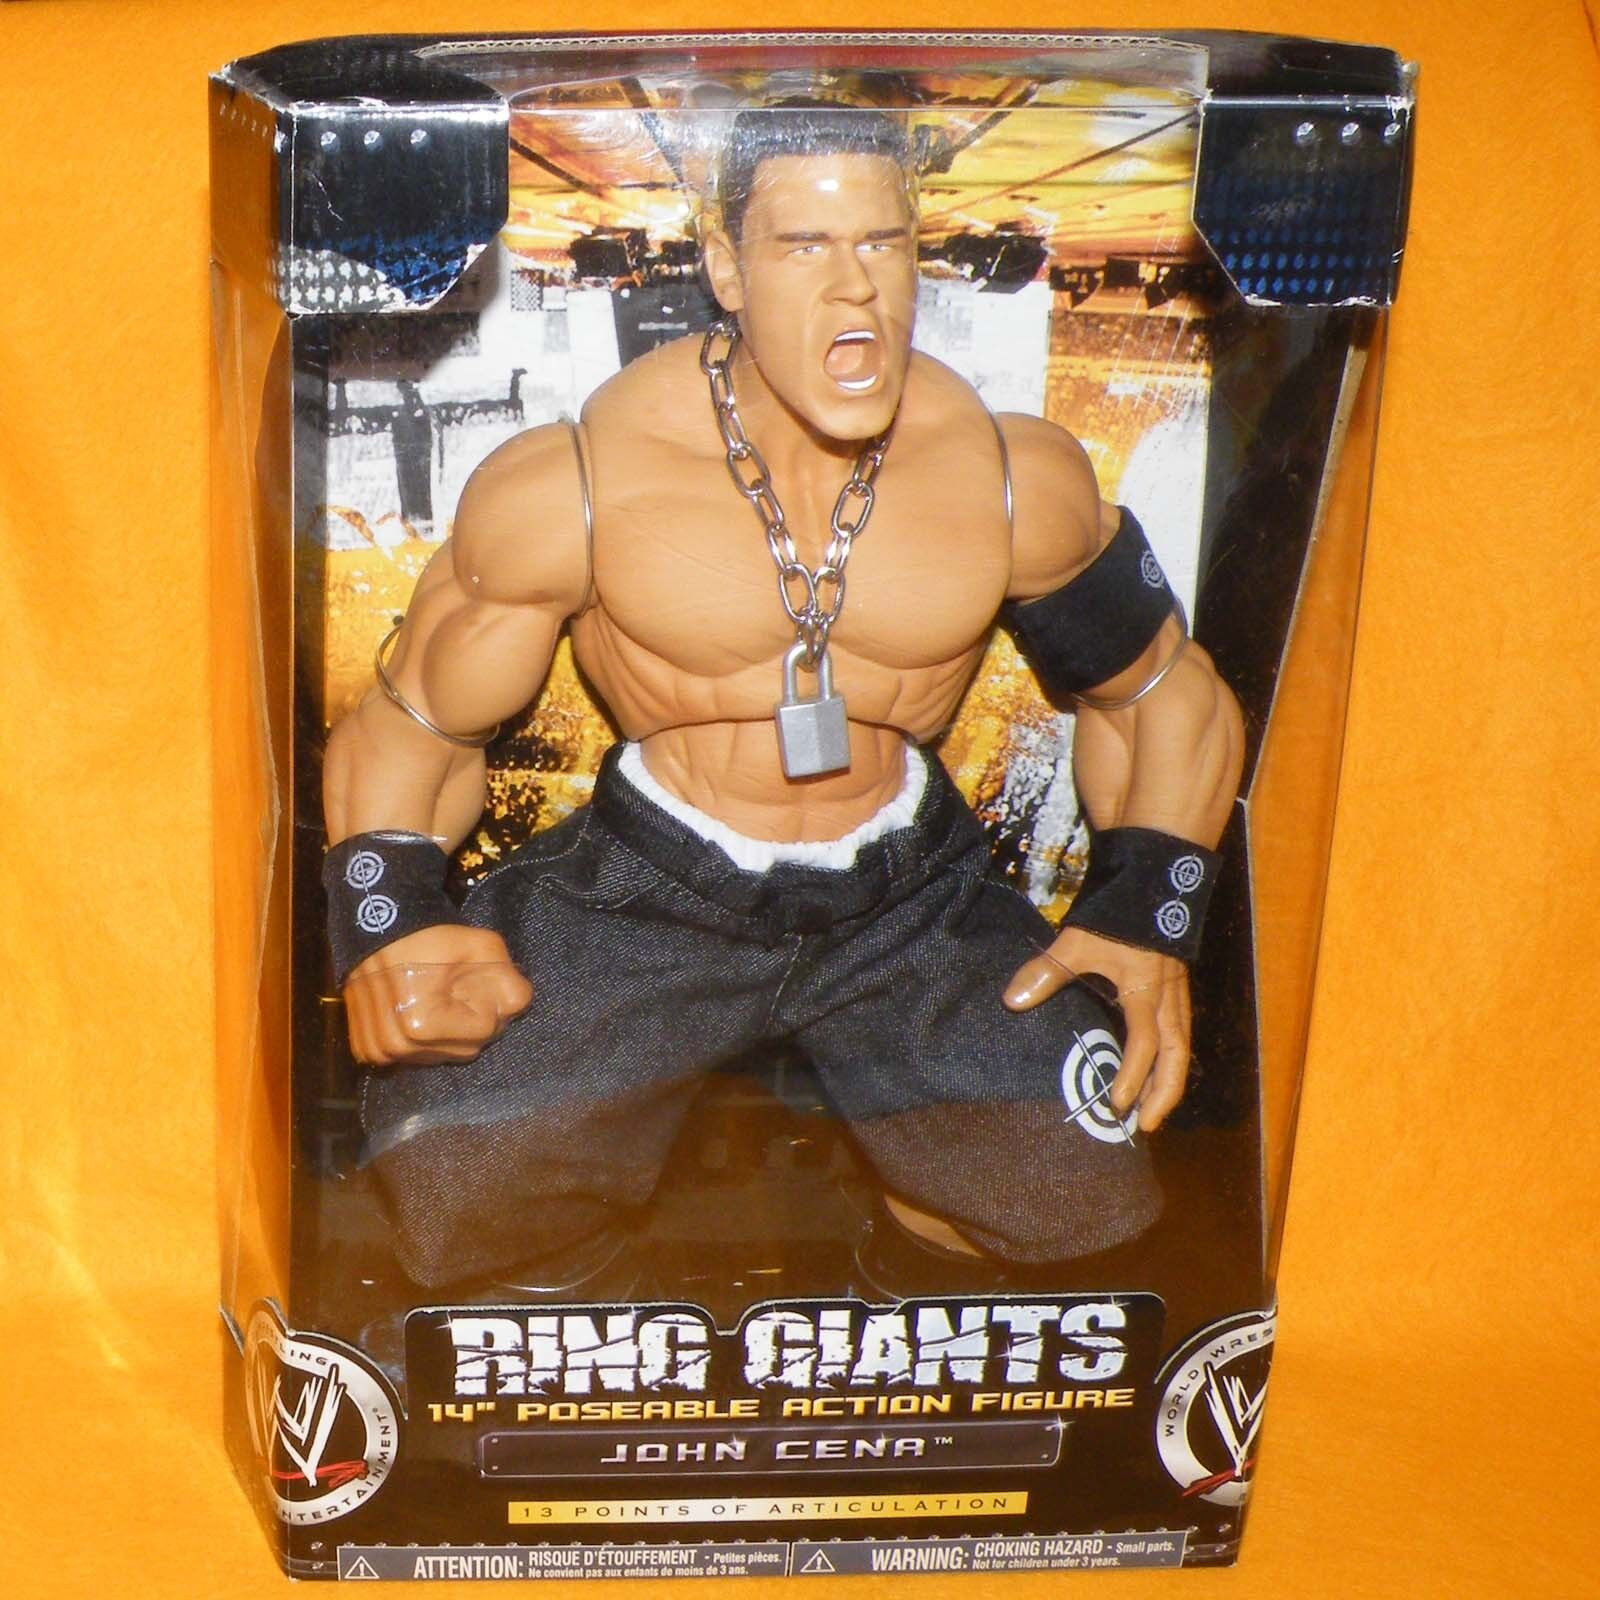 2006 JAKKS WWE RING GIANTS JOHN CENA 14  POSEABLE ACTION FIGURE BOXED SEALED